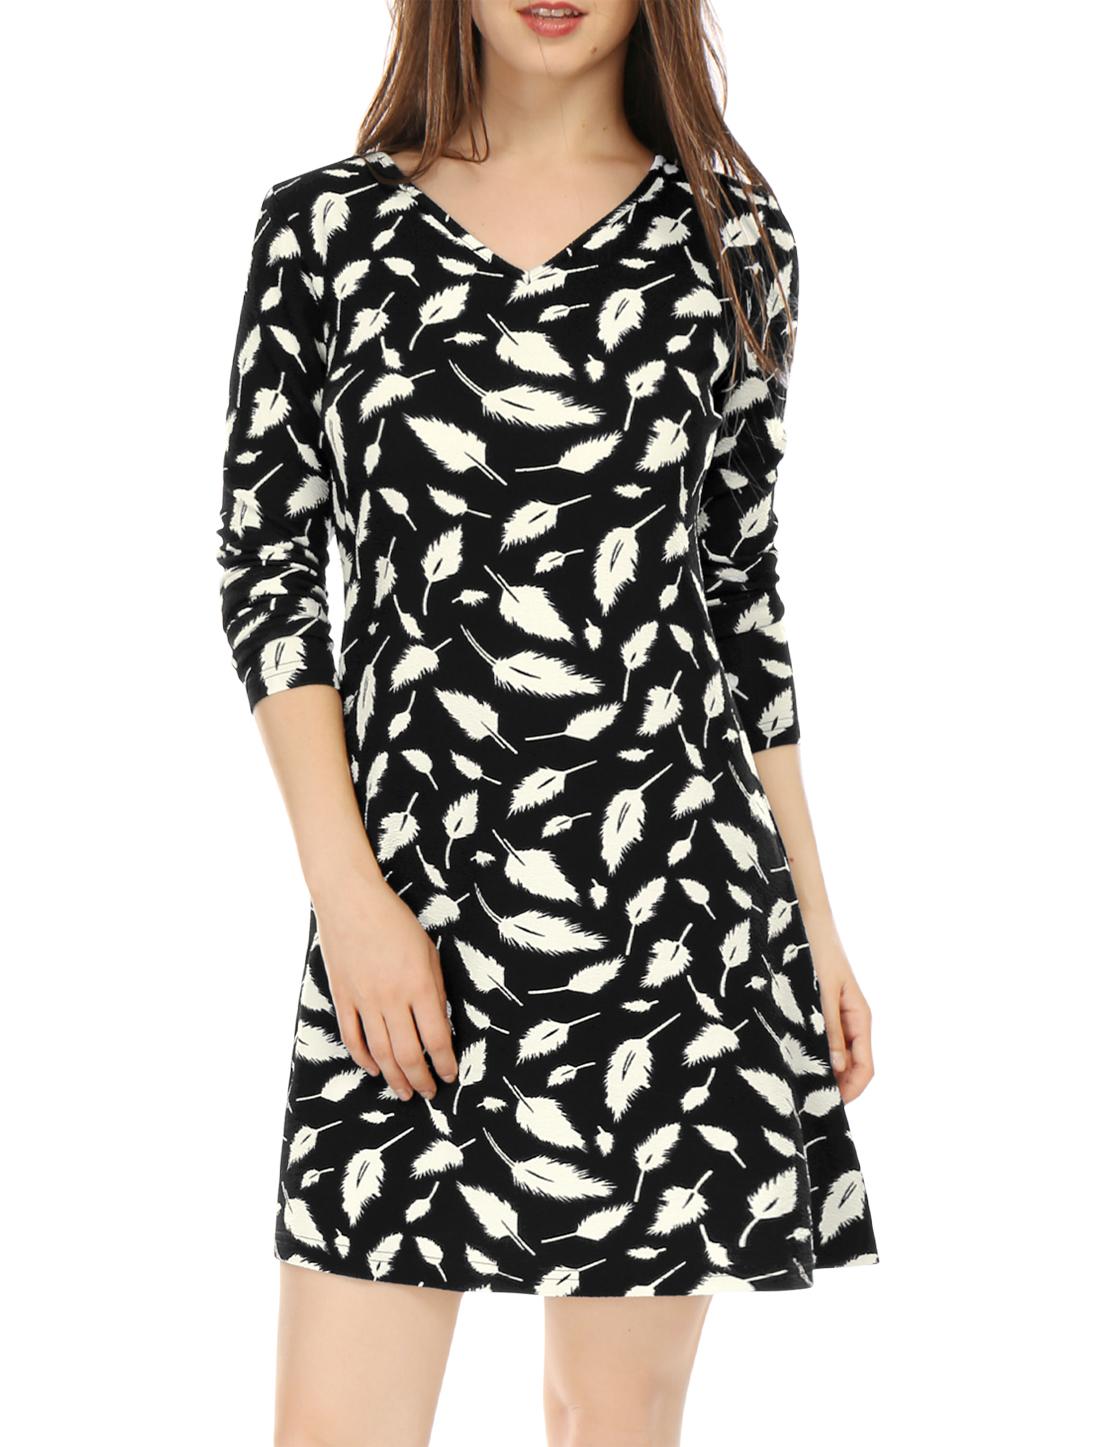 Allegra K Women V Neck Long Sleeves Feather Print Mini Dress Black XL